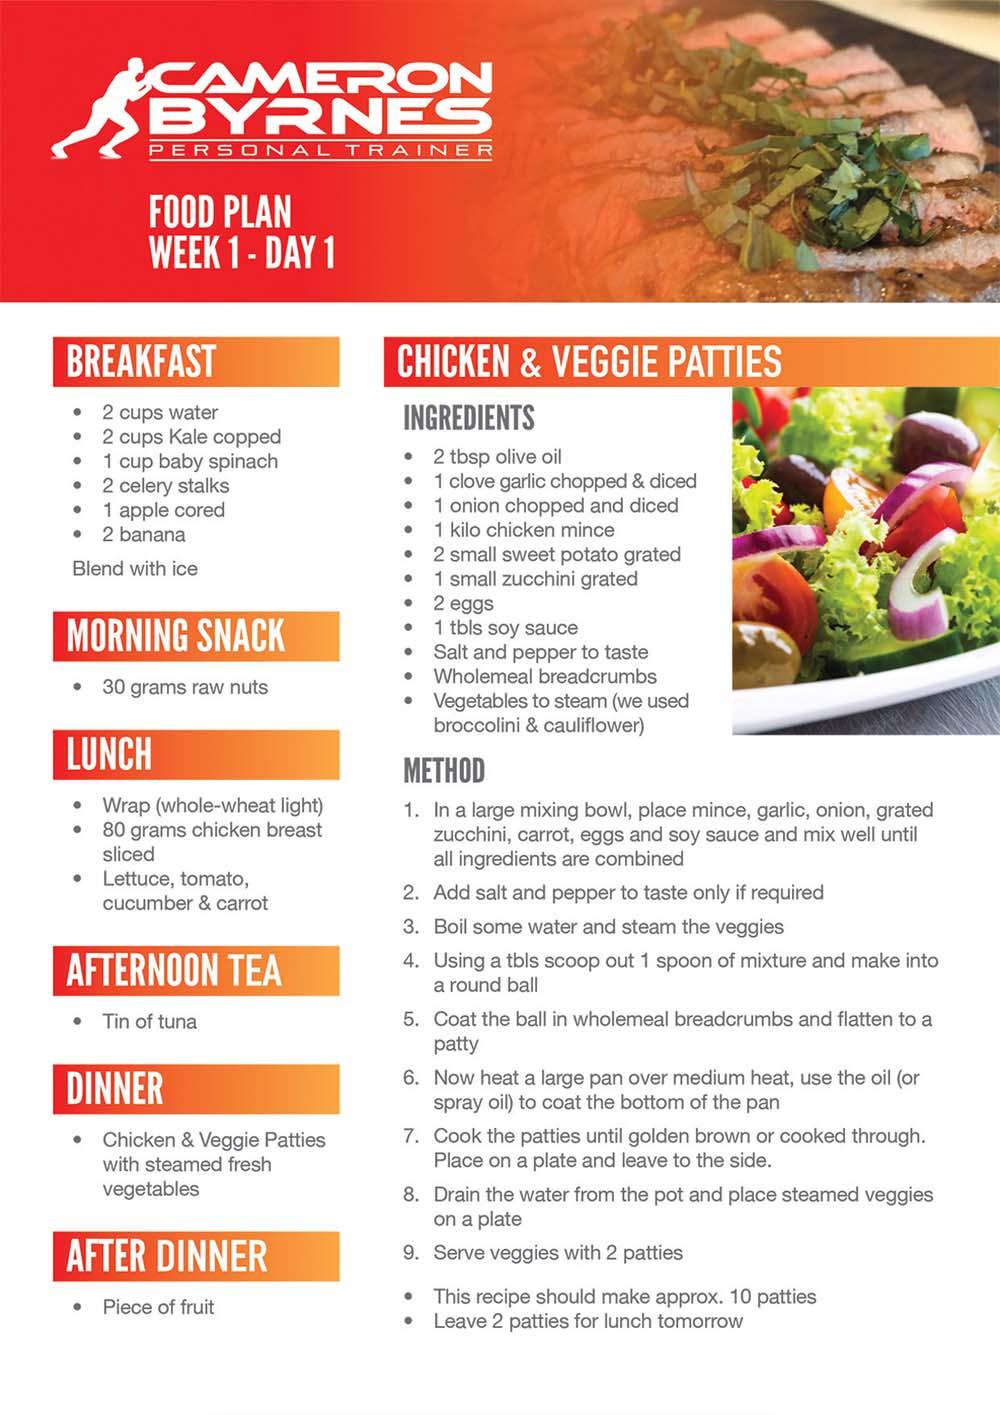 Cameron Byrnes meal plan